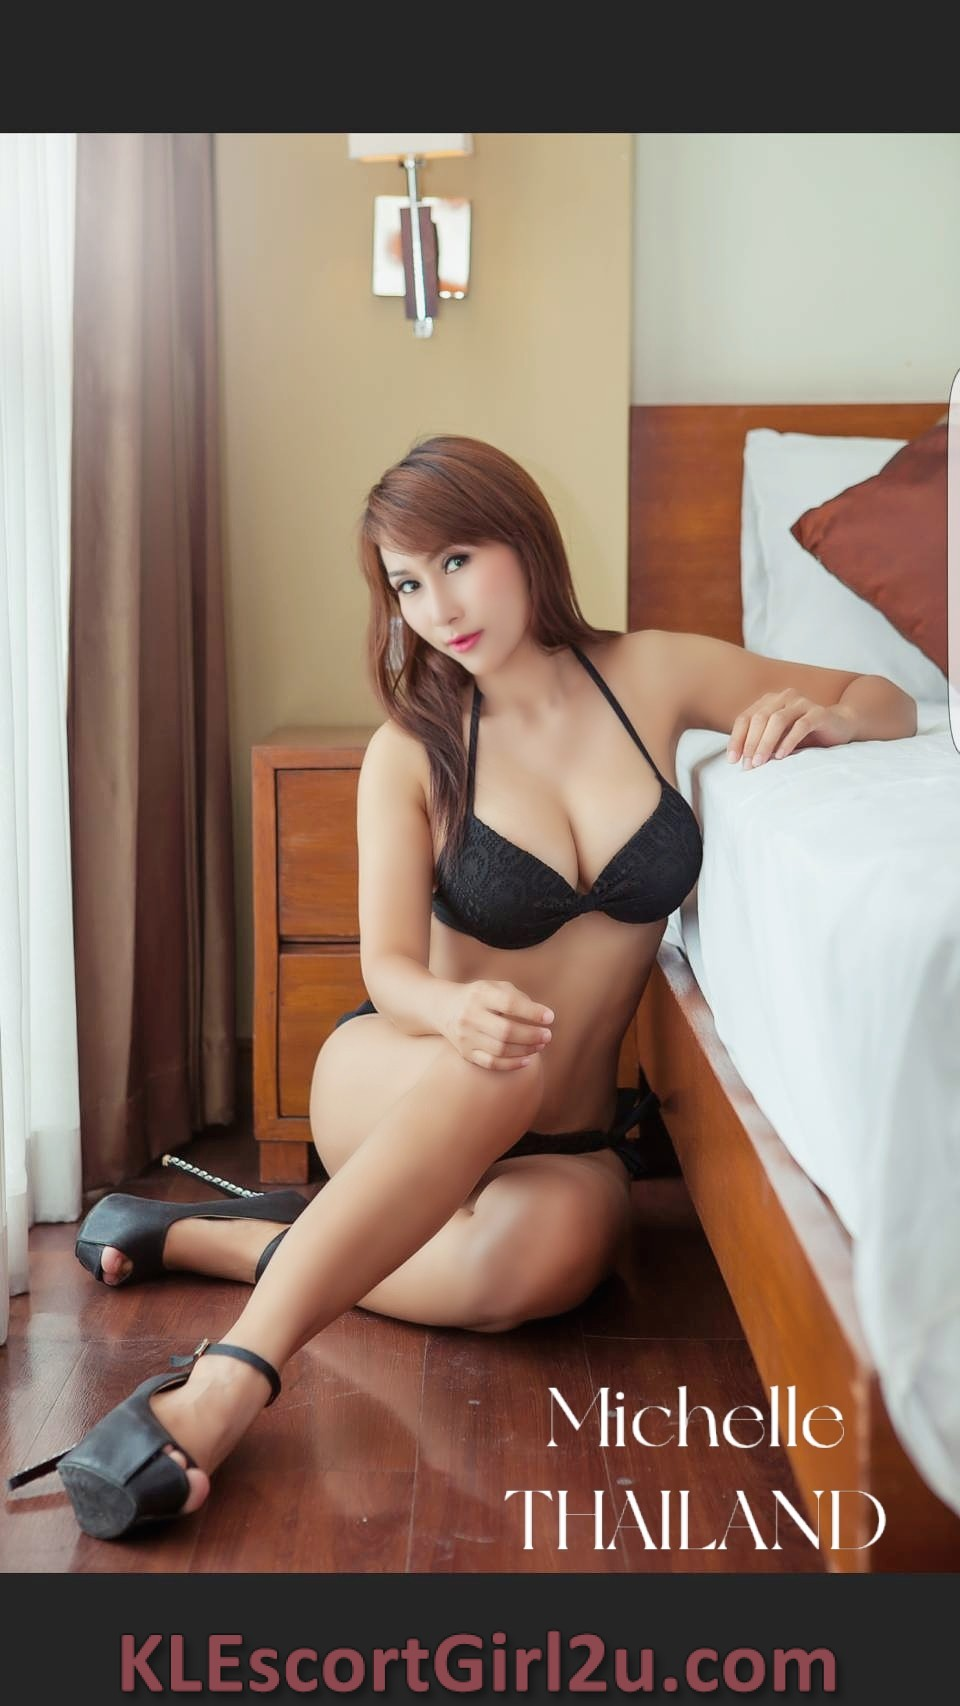 Sri Petaling Escort - Thai Model - Michelle